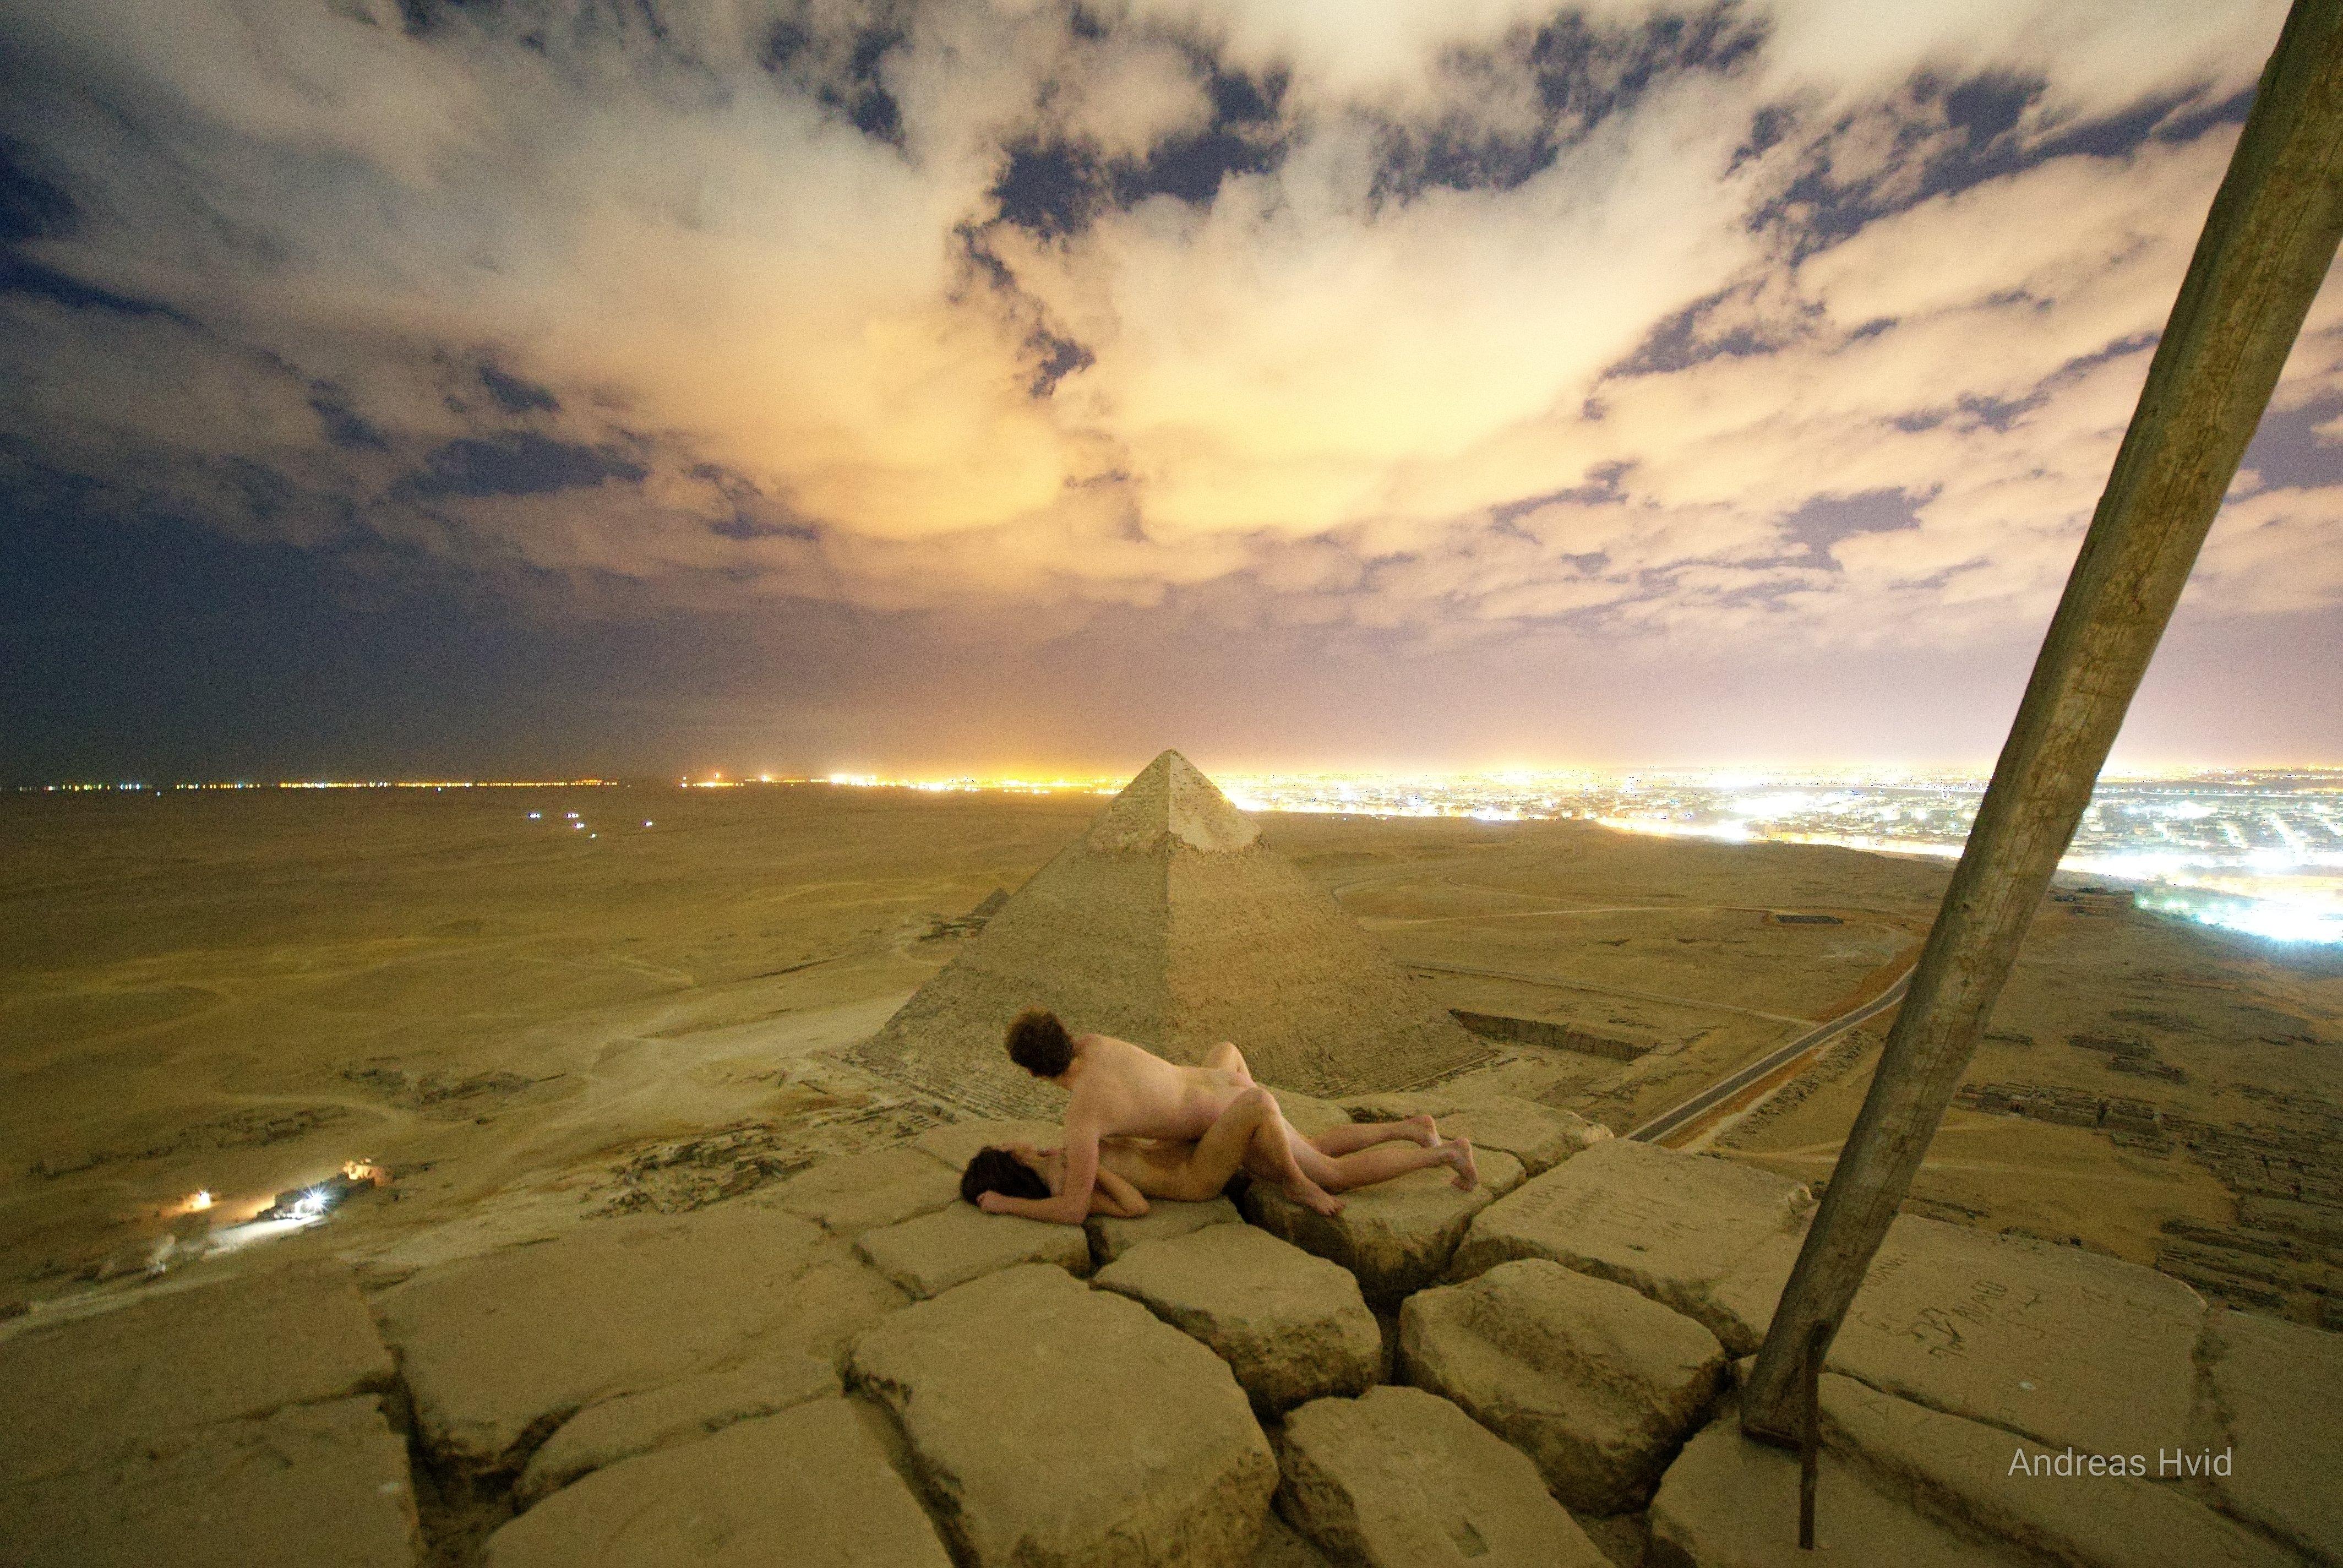 Piràmide Guiza parella nua Egipte